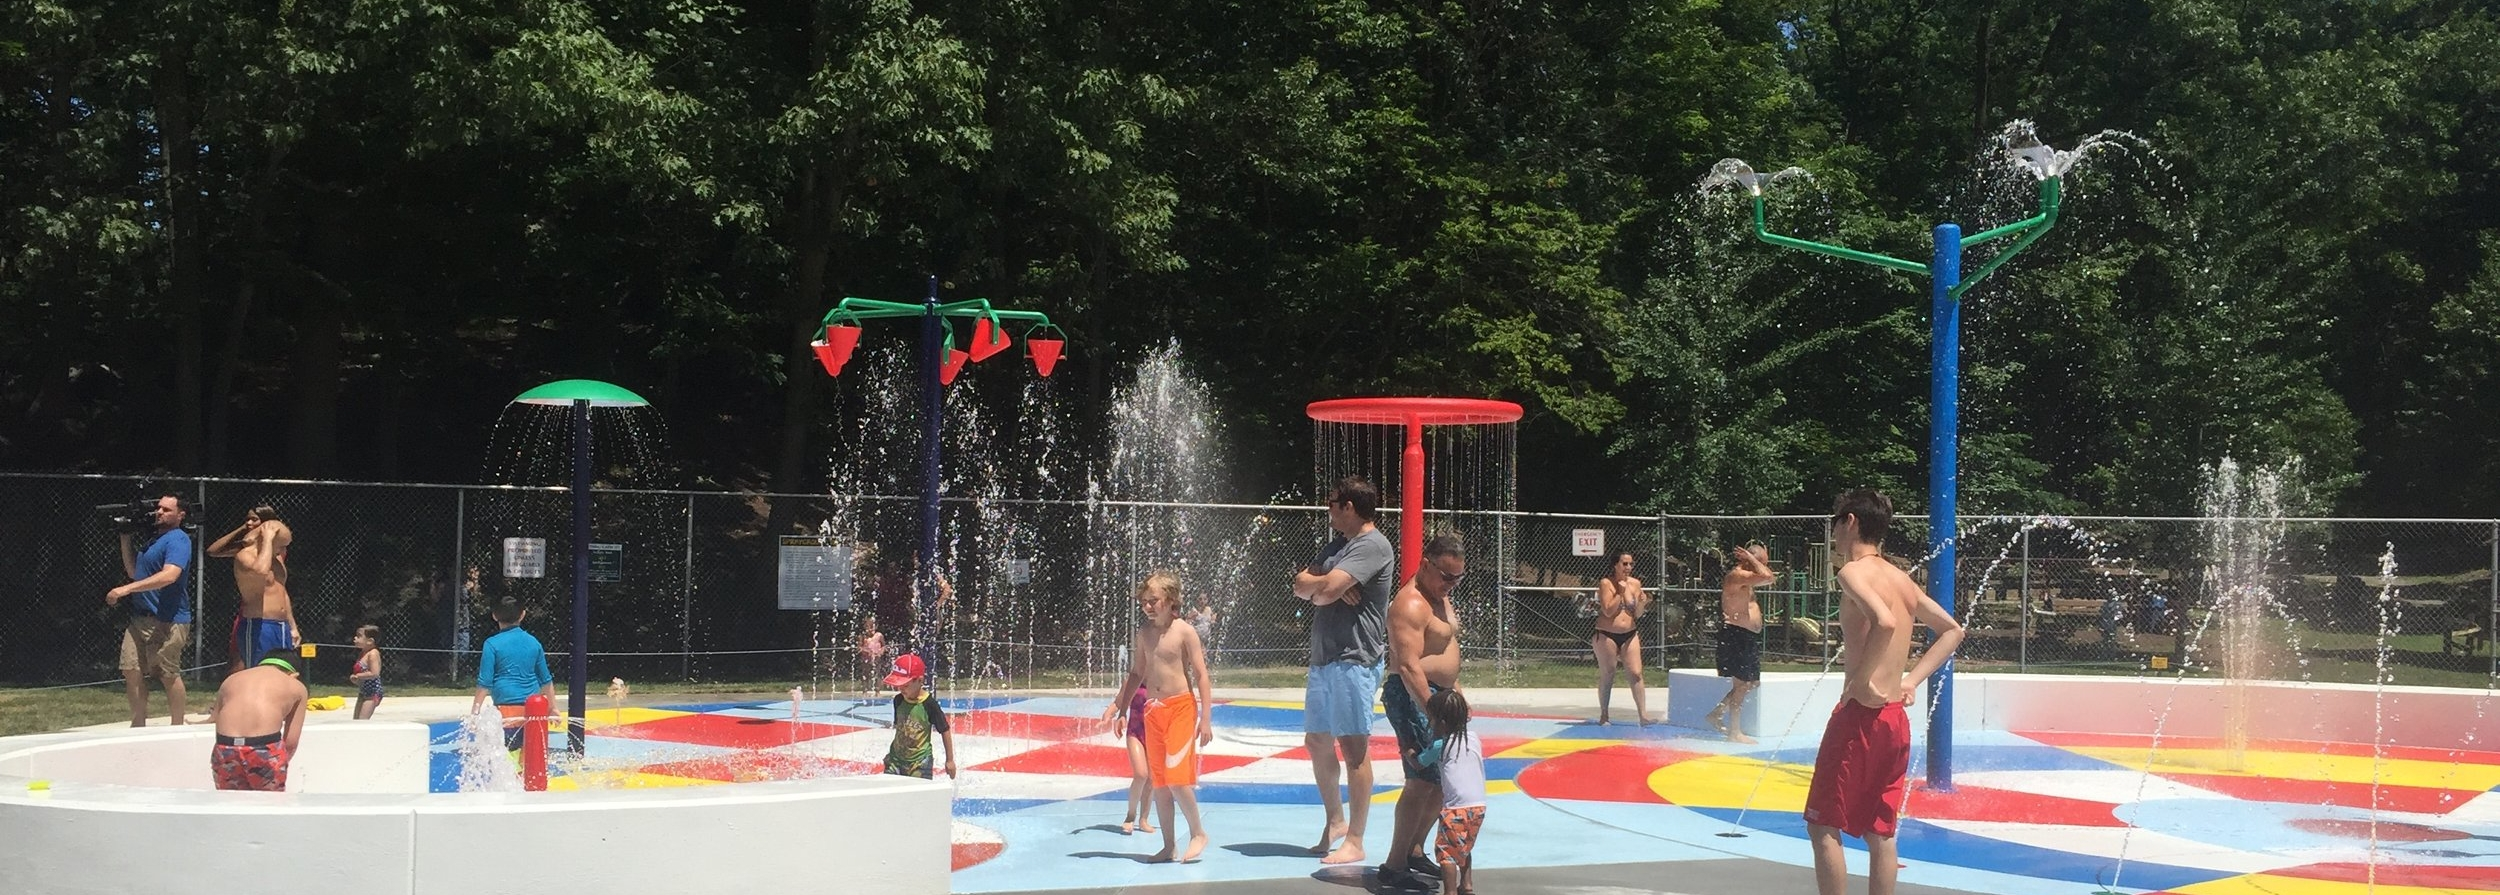 Sprain Ridge spray park.